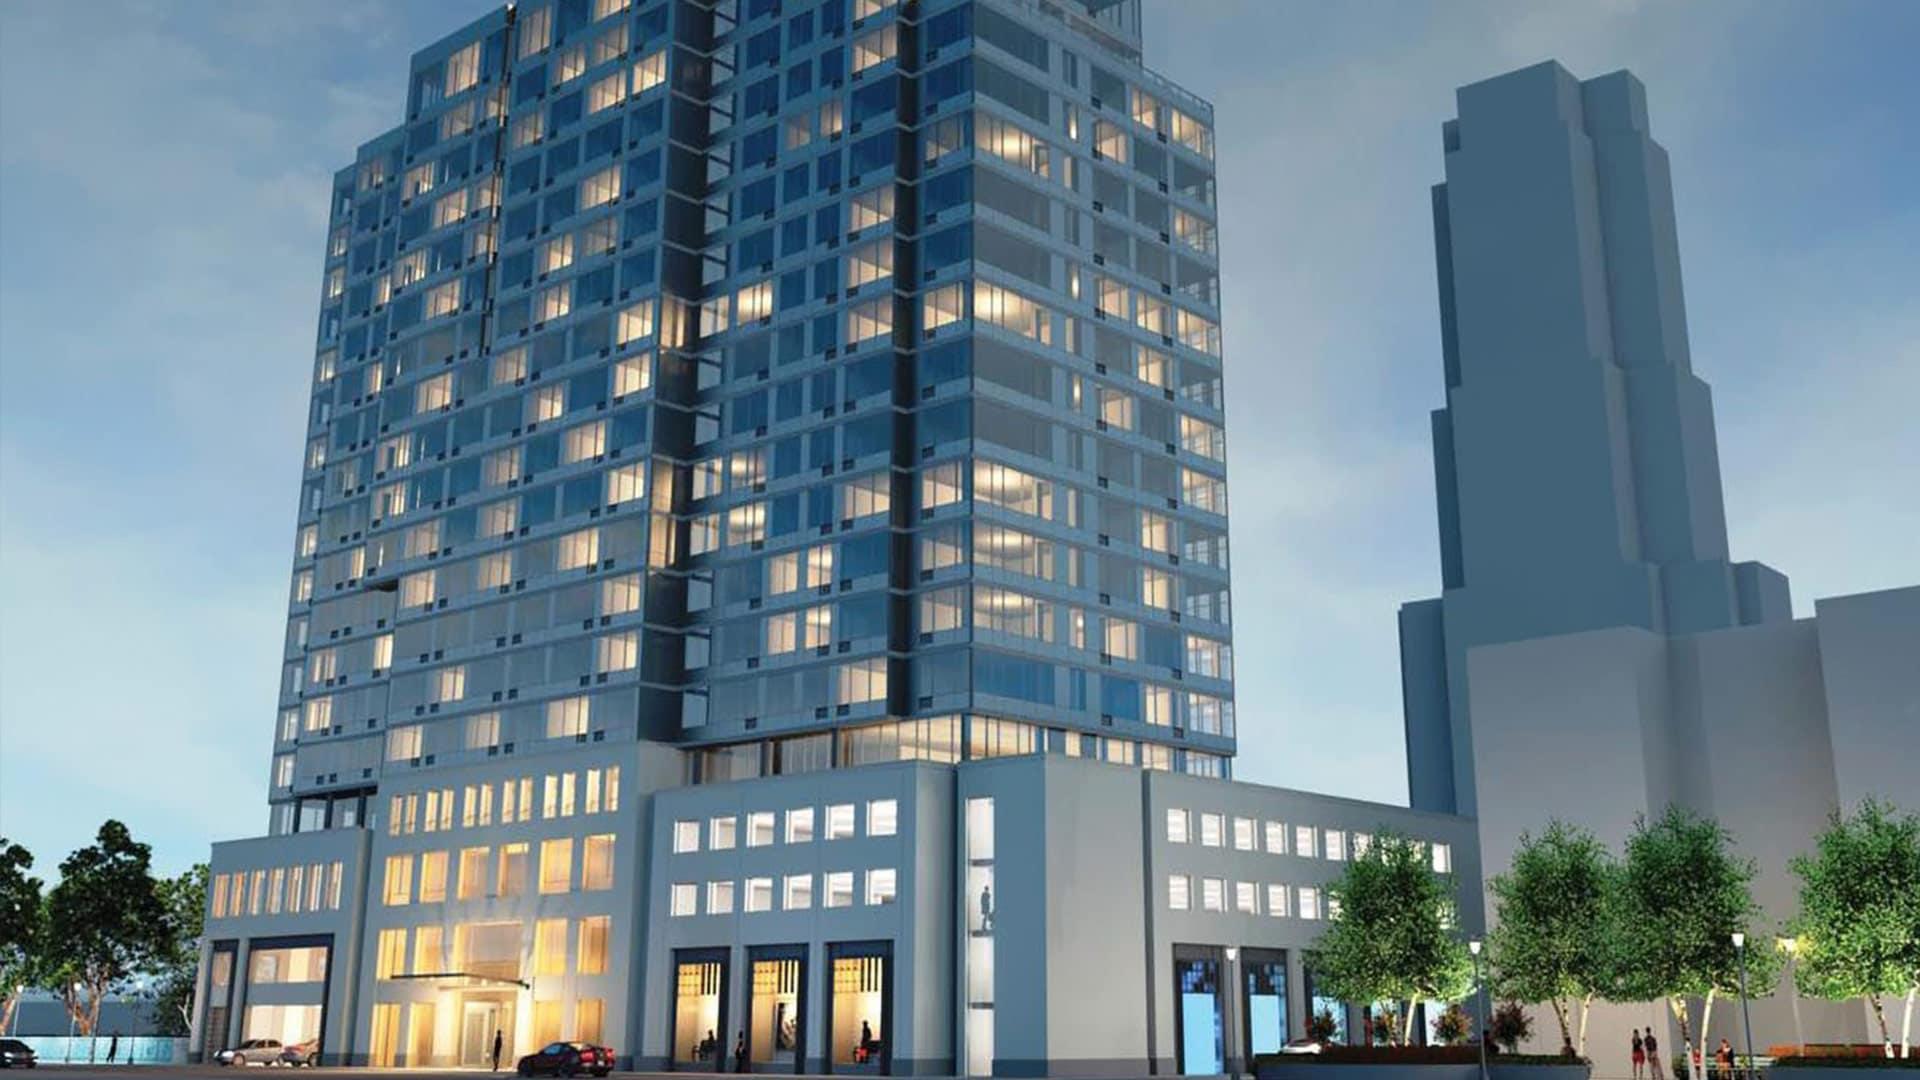 Updated rendering of 11 Garden Street - Stephen B. Jacobs Group